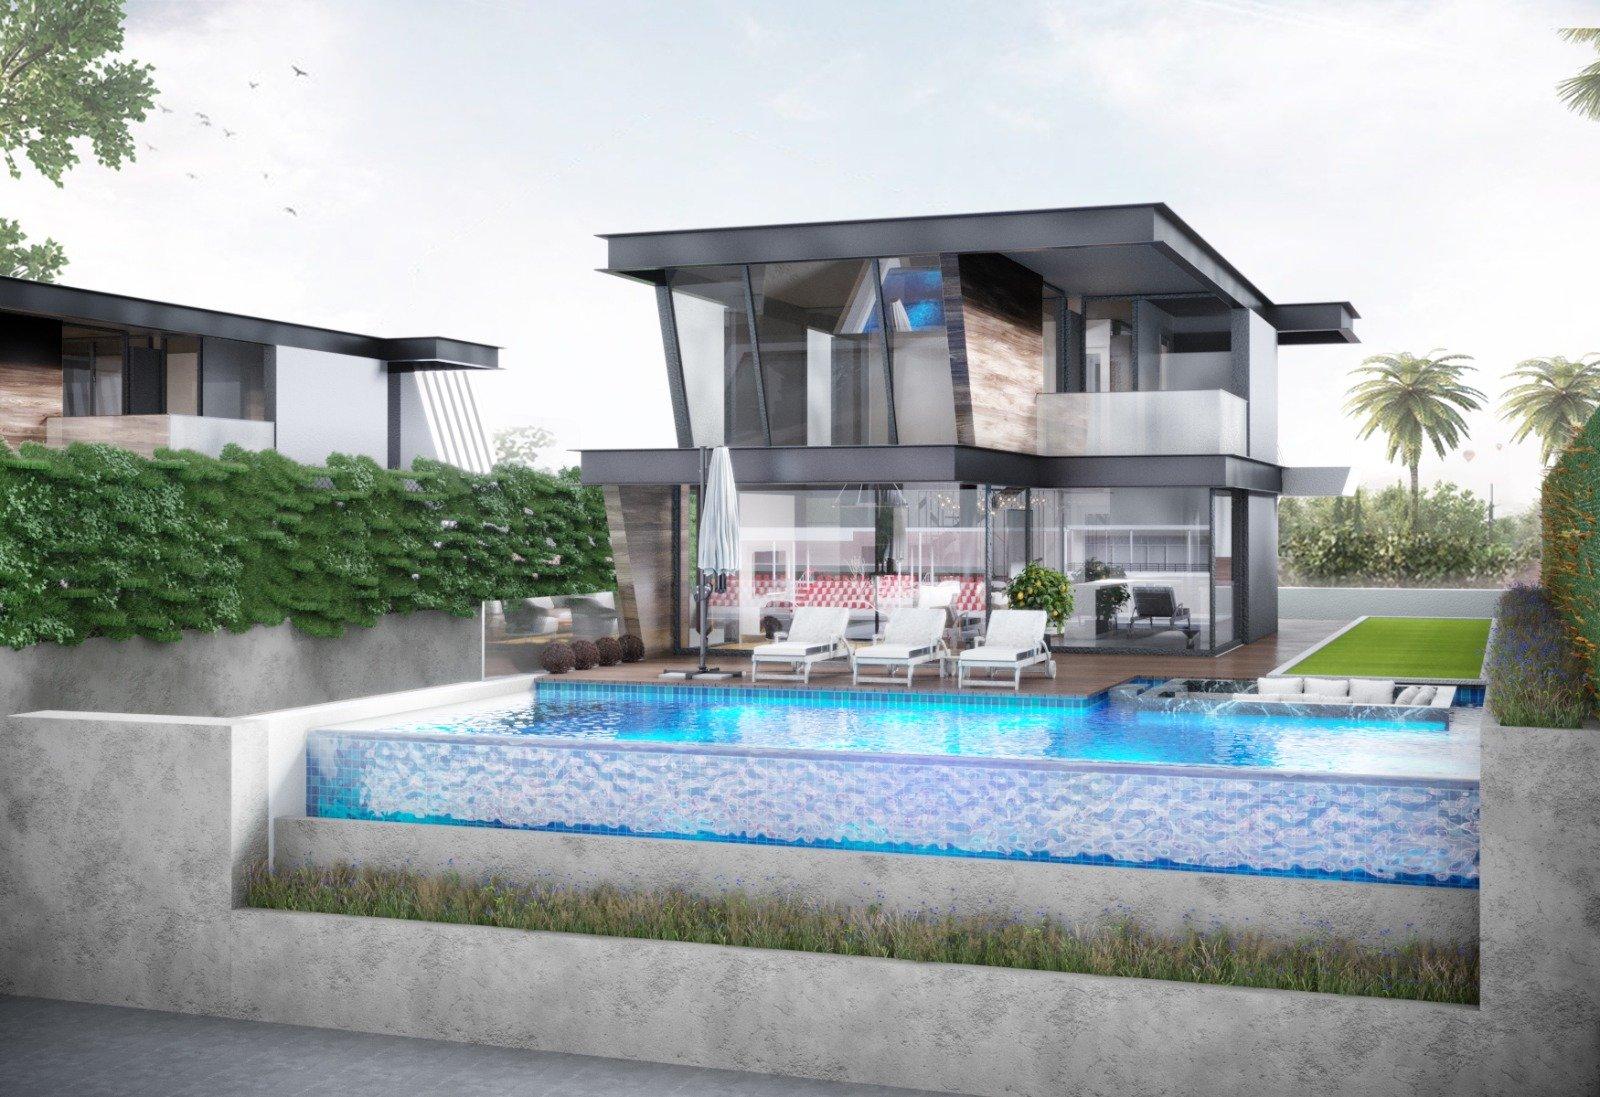 Mandalina Evleri 31-Ayayorgi Terraza  Projesi